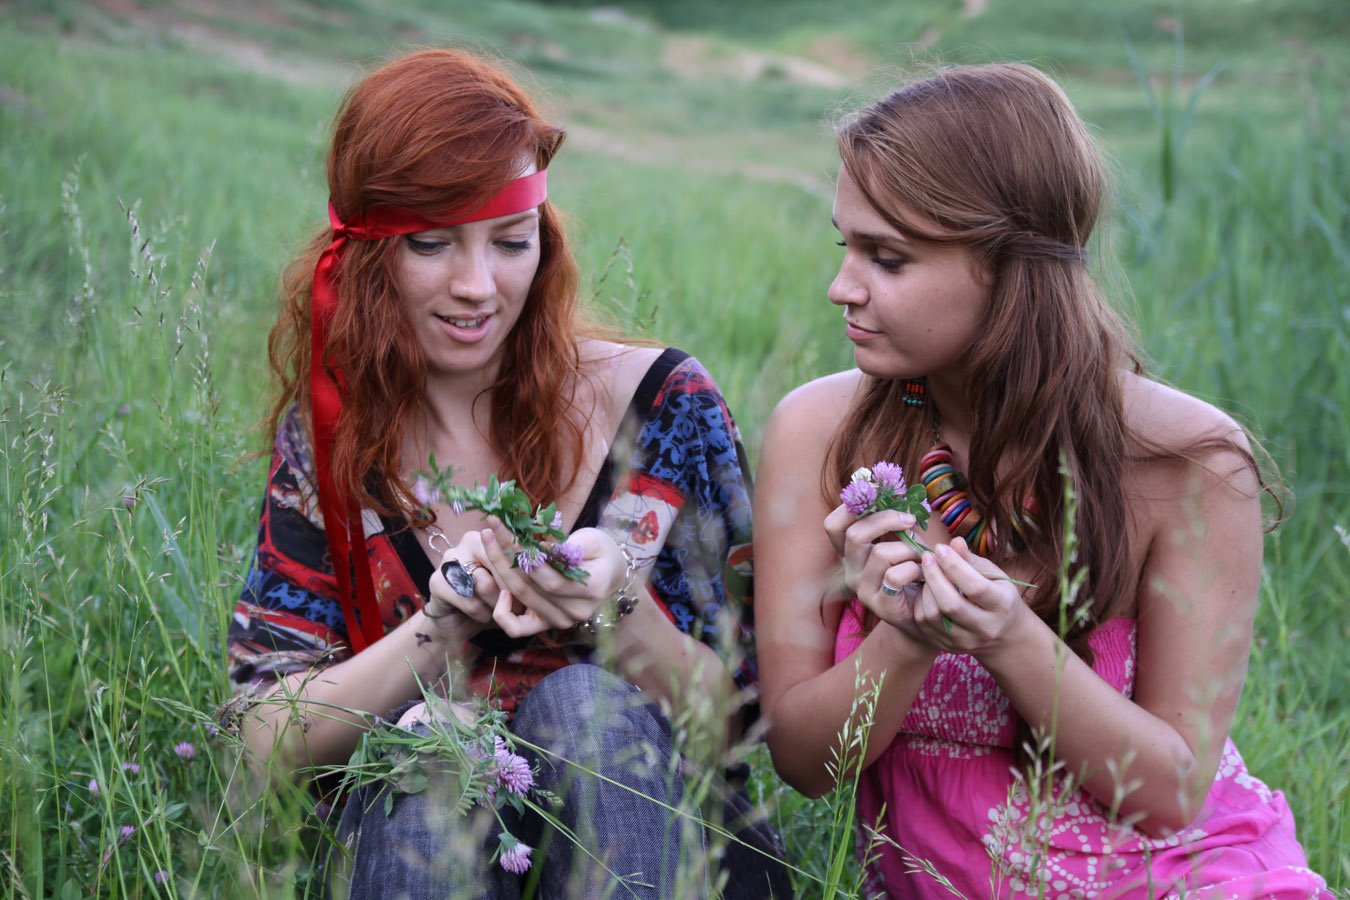 Снятие венца безбрачия с помощью ритуала с венком